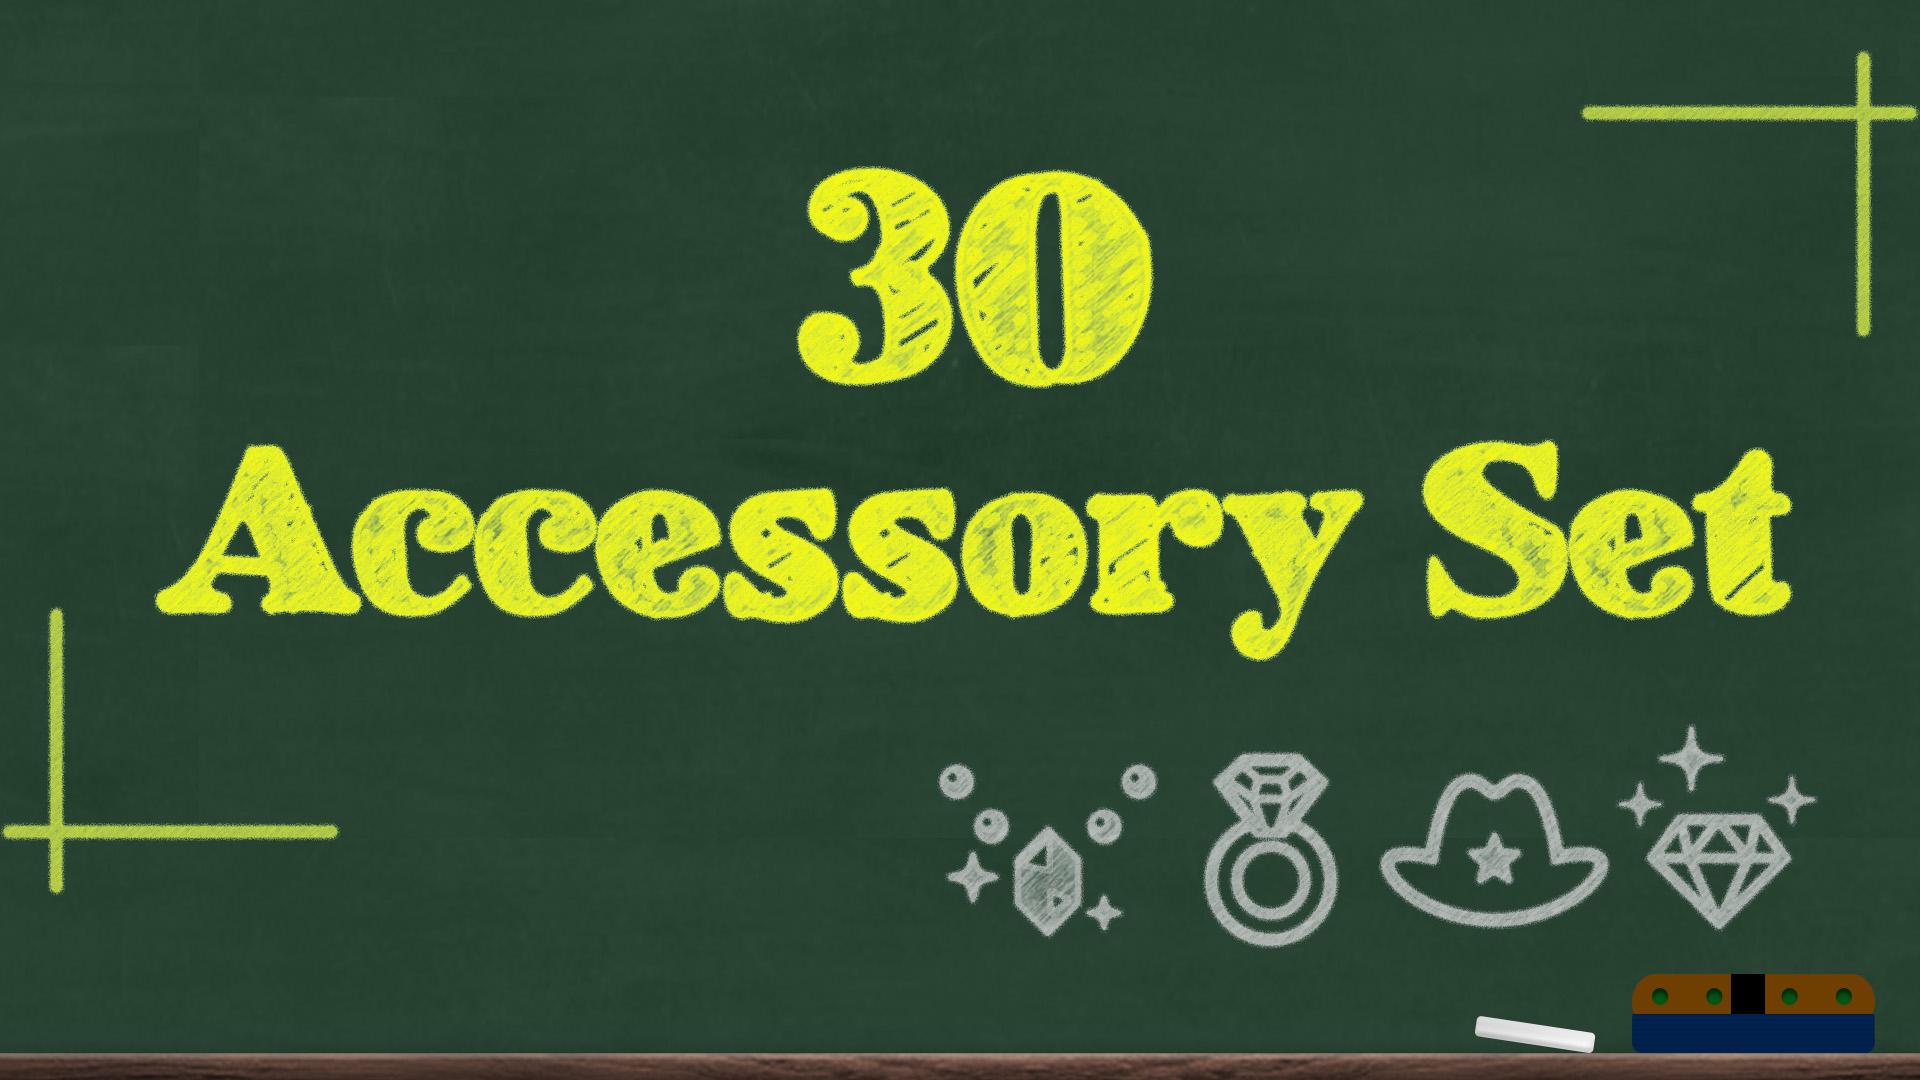 30 Accessory Set